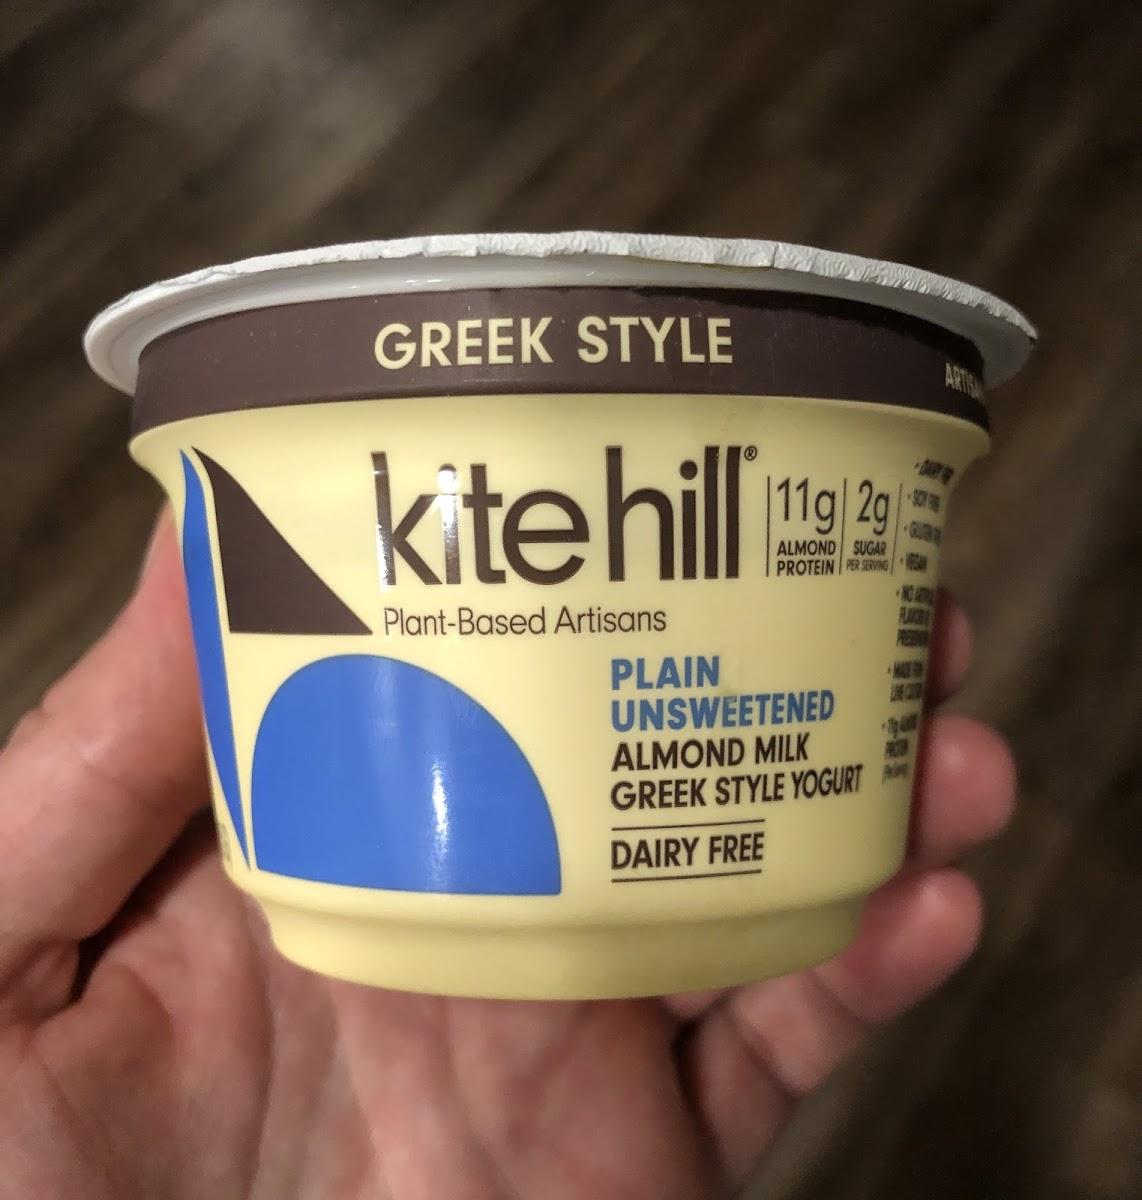 Plain Unsweetened Almond Milk Greek Style Yogurt